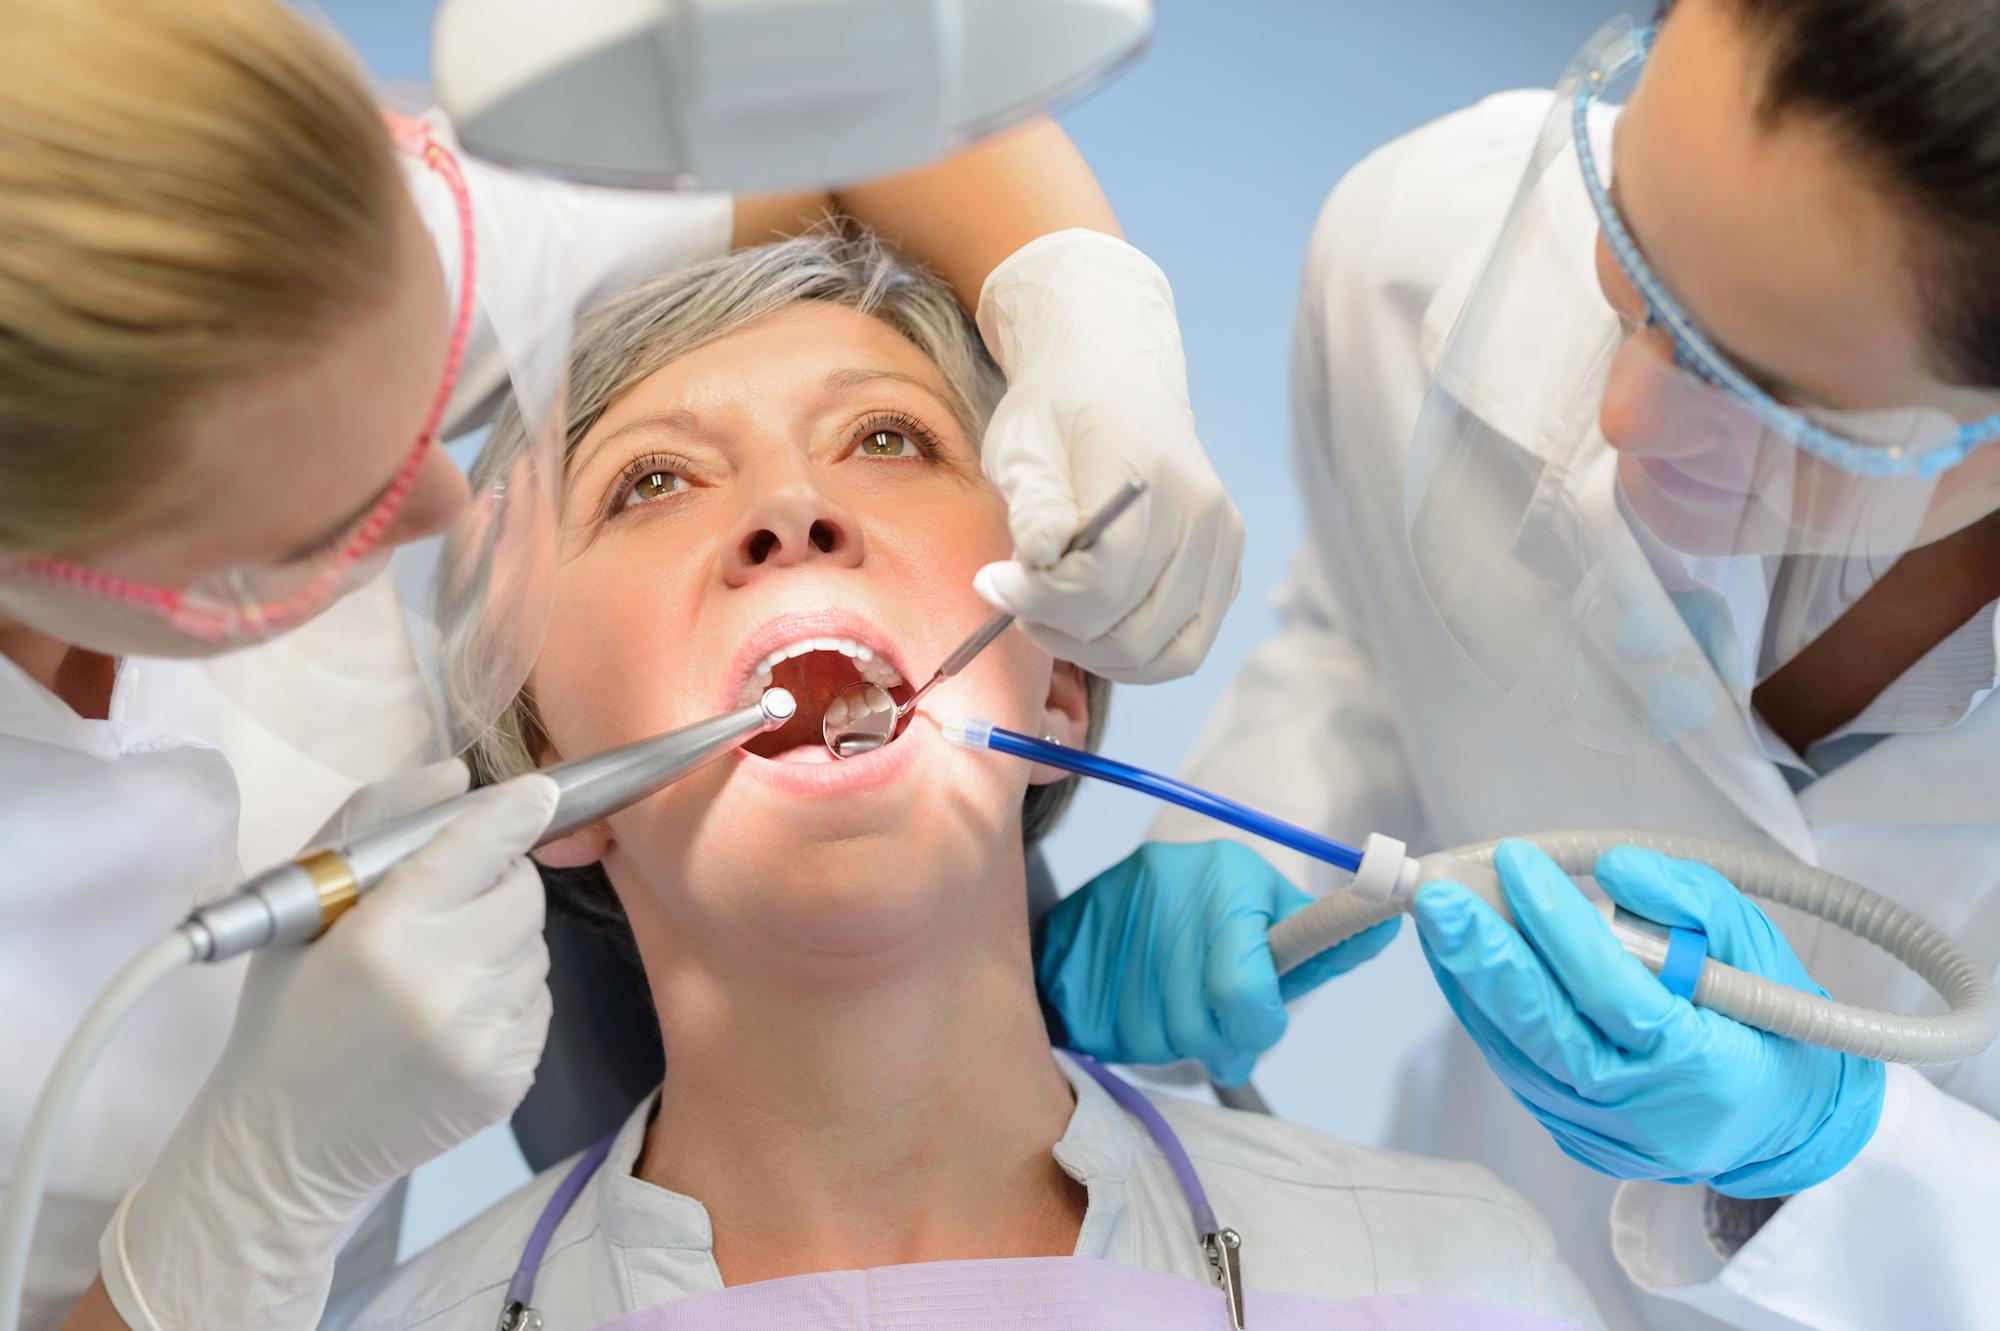 periodontal disease Jackson, MS periodontist